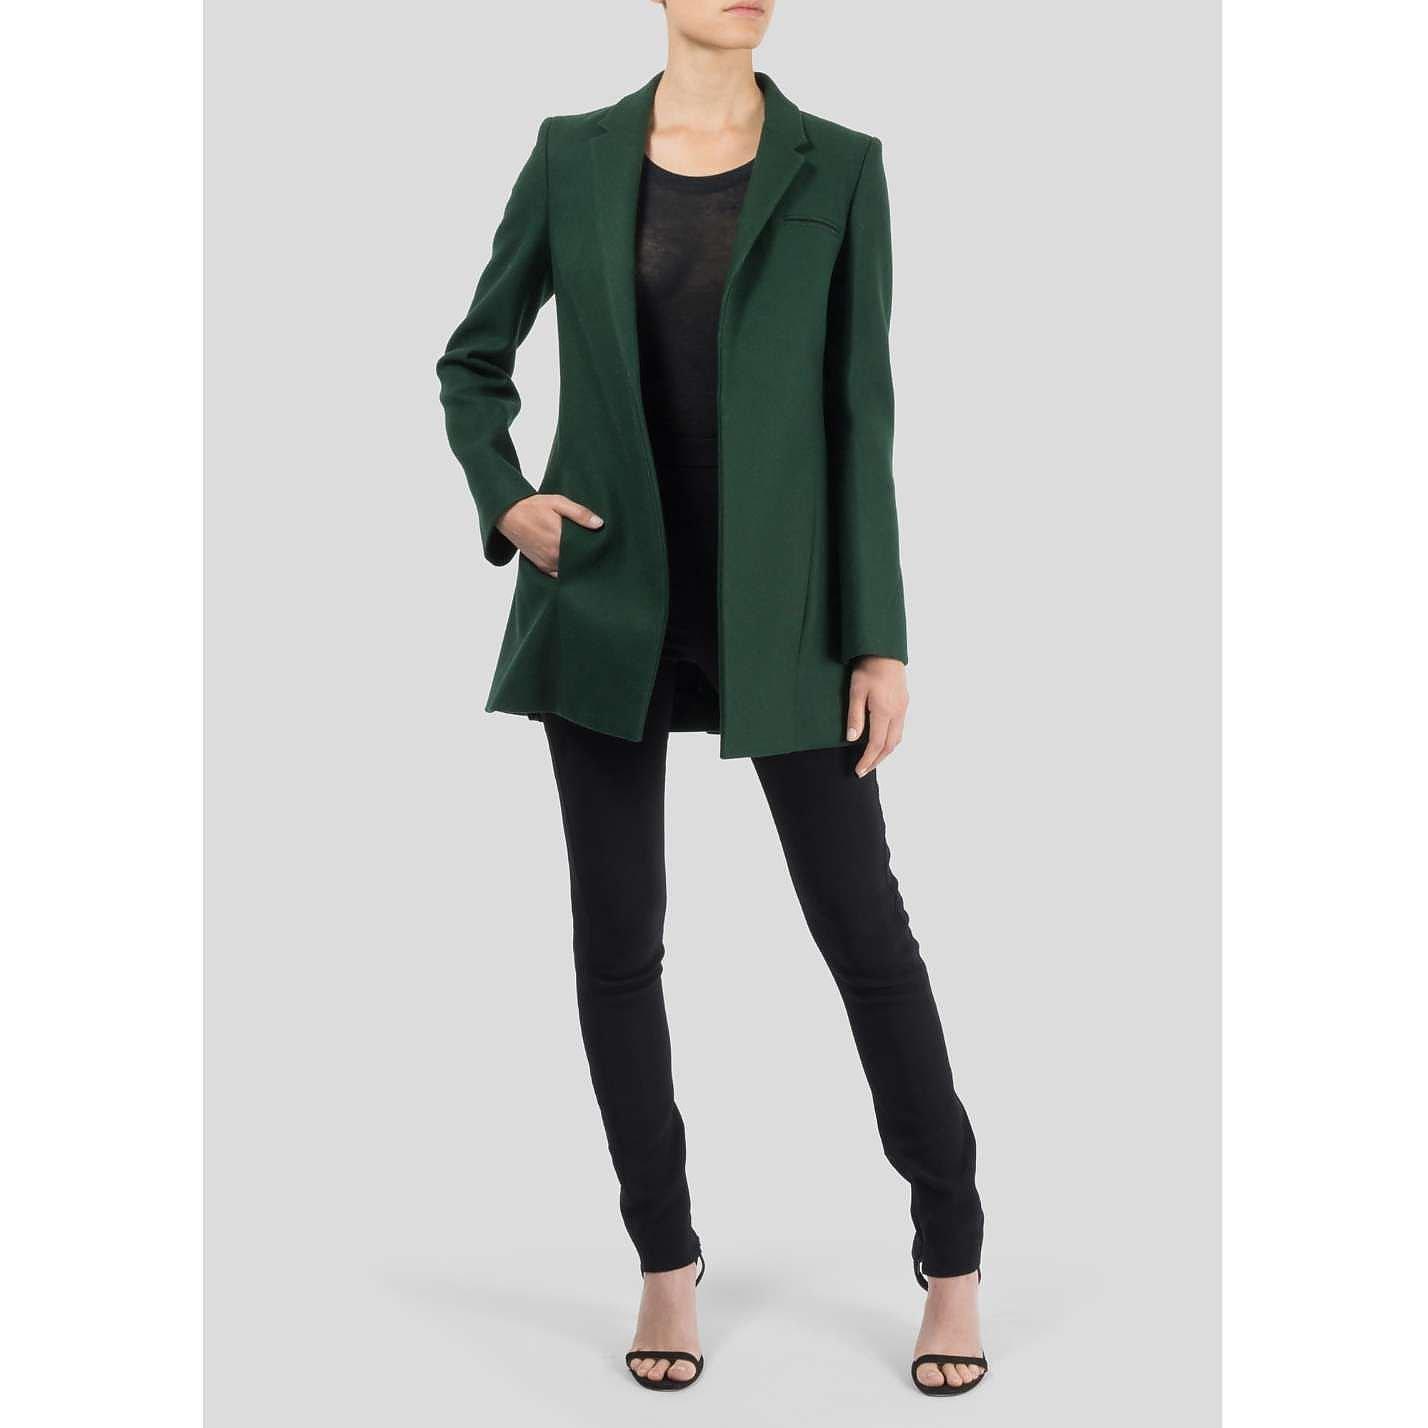 Manoush Wool Jacket